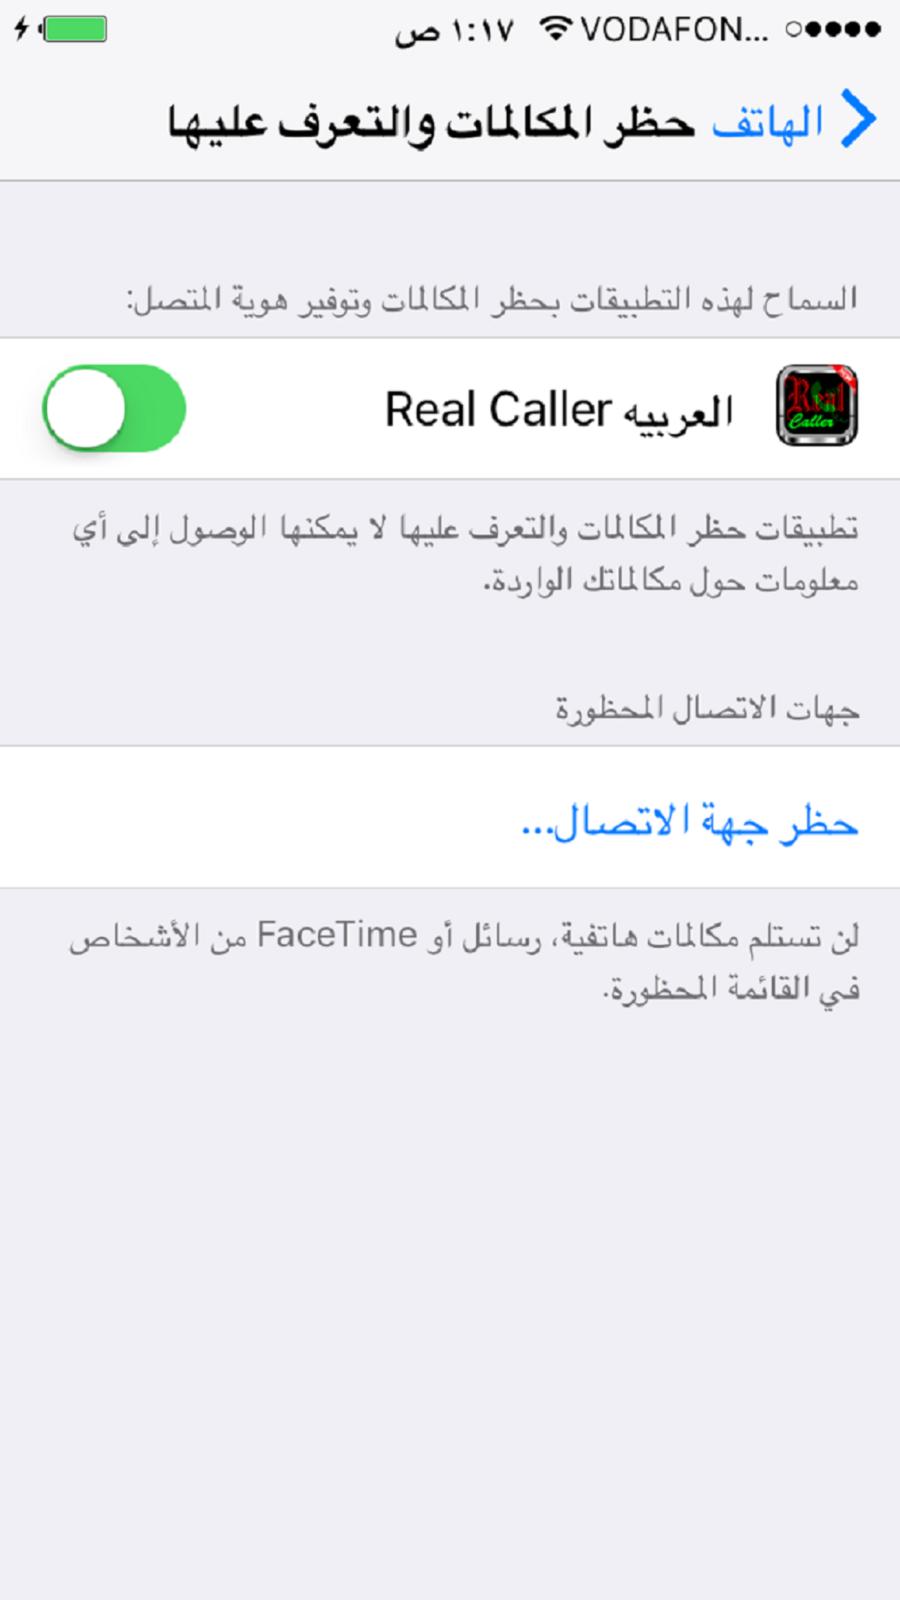 RealCaller 丿賱賷賱賴賵賷丞 丕賱賲鬲氐賱